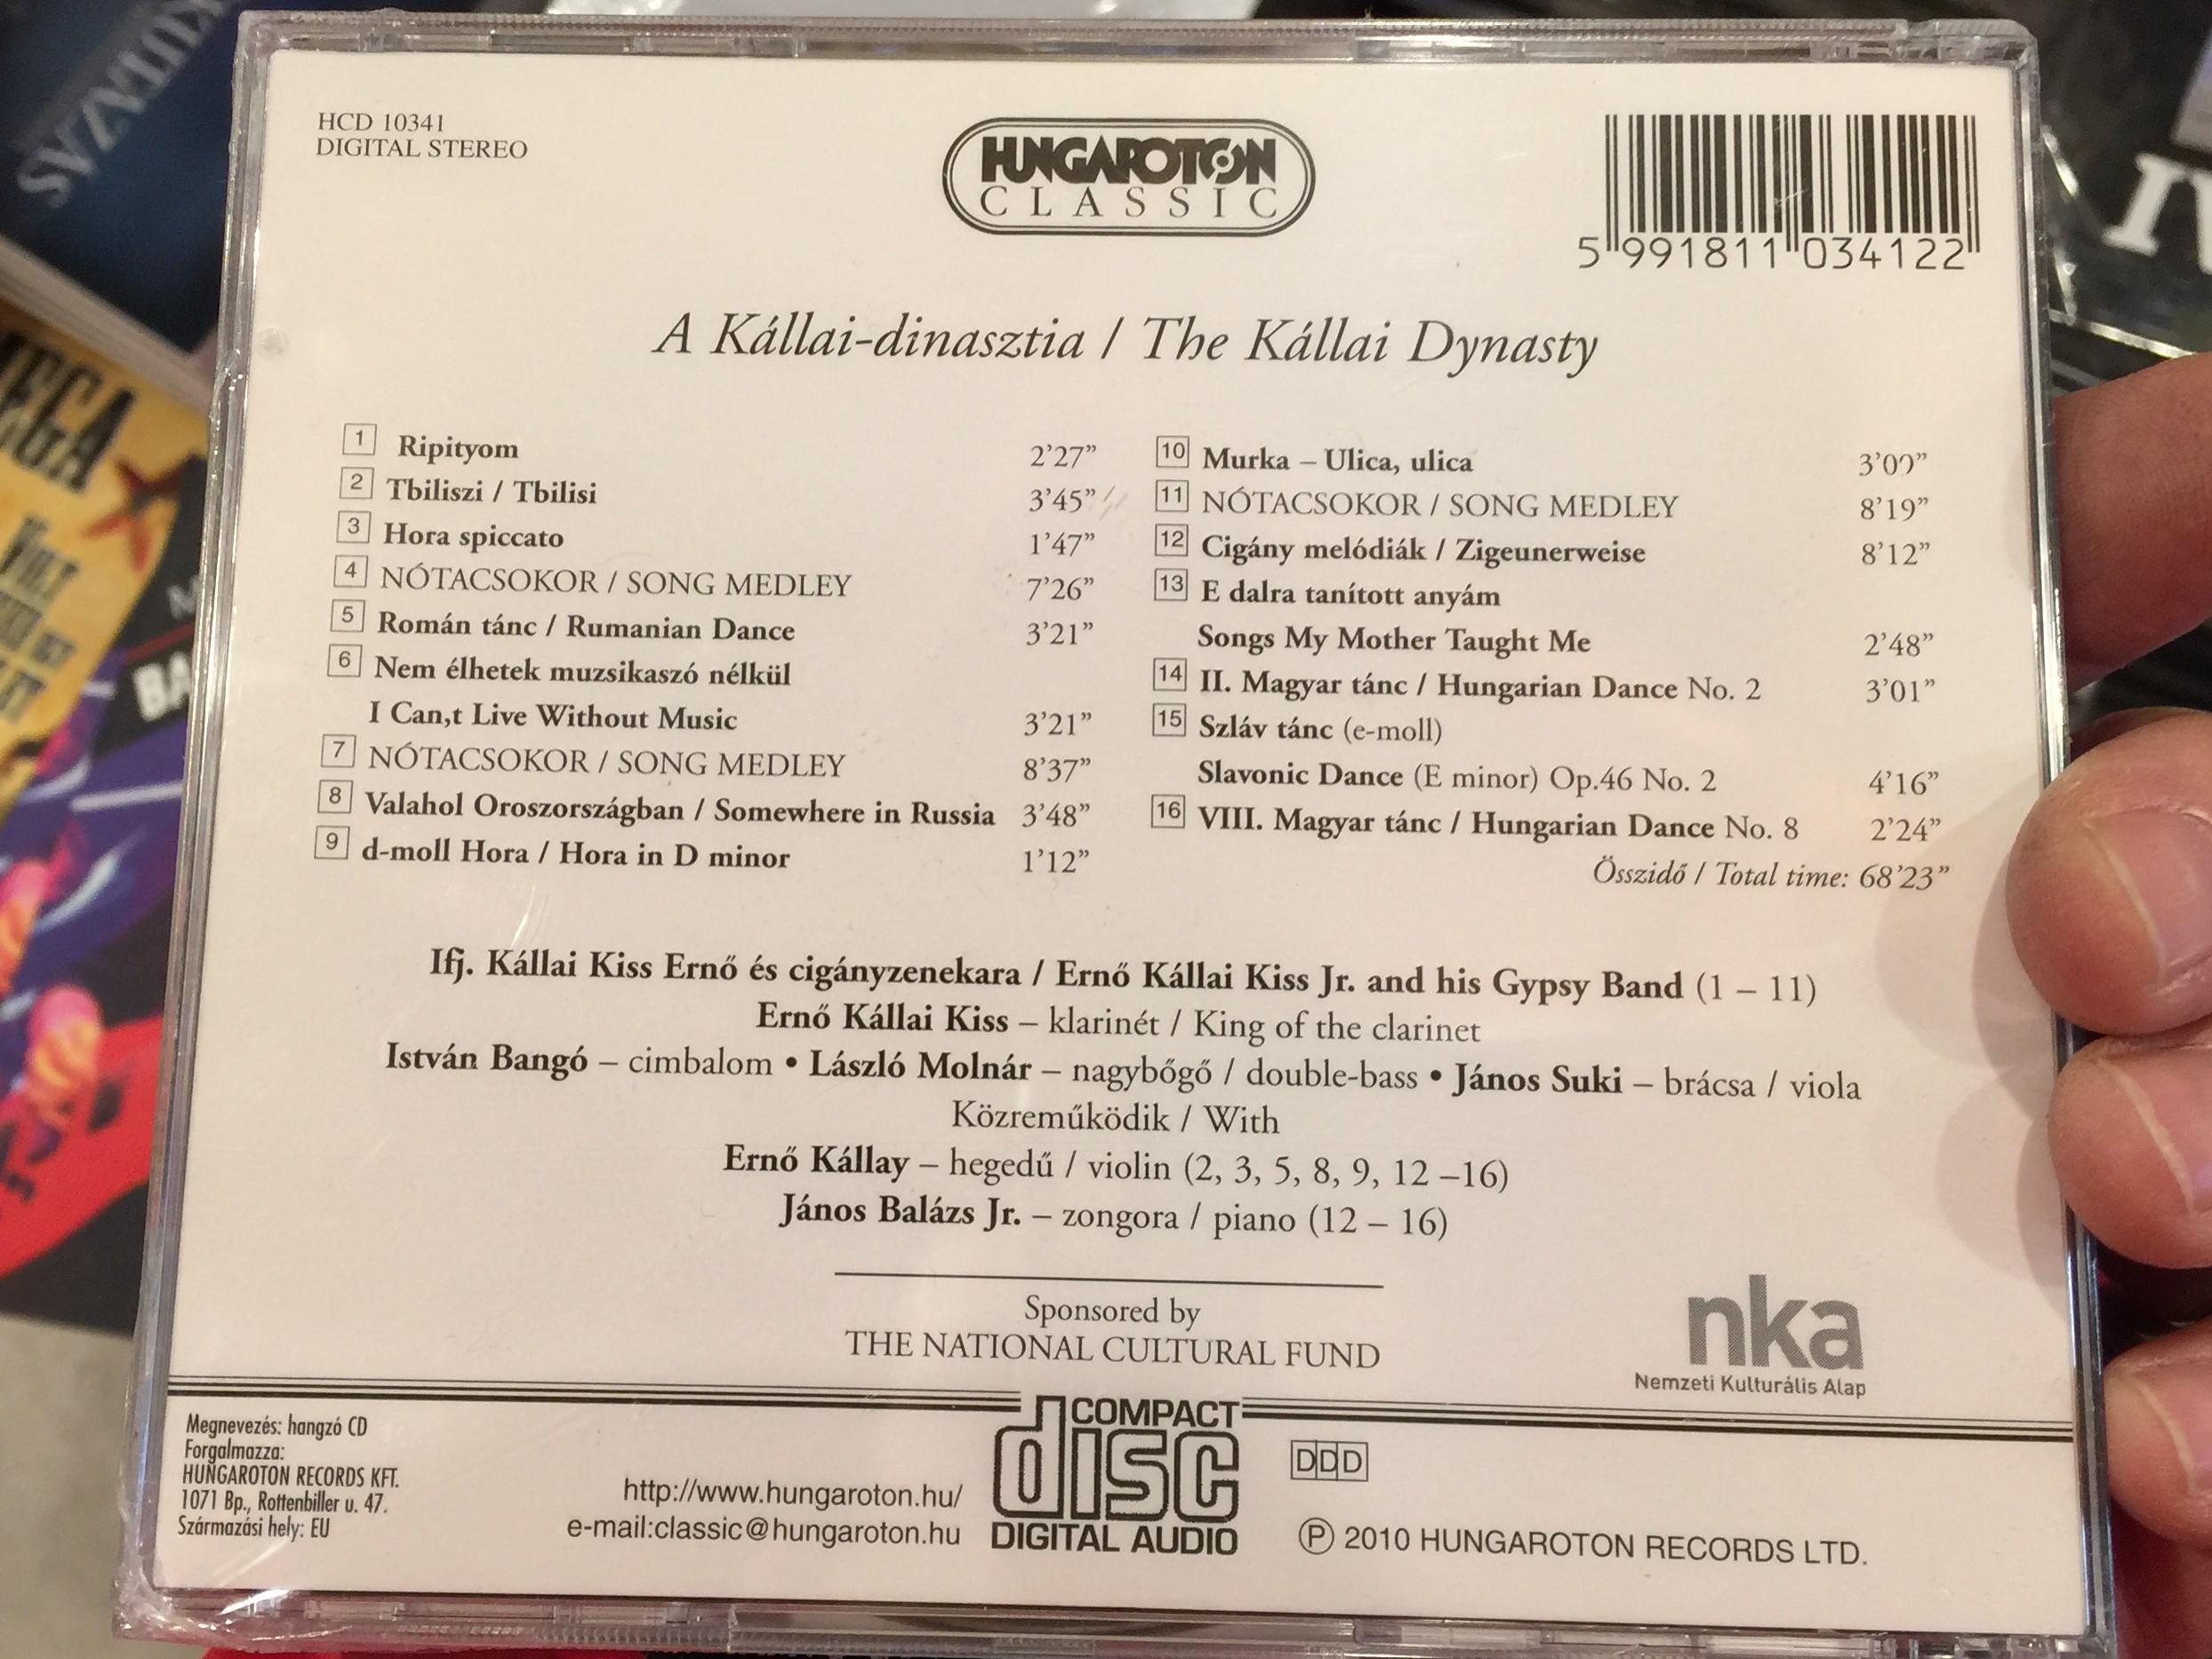 a-kallai-dinasztia-hungaroton-classic-audio-cd-2010-stereo-hcd-10341-2-.jpg